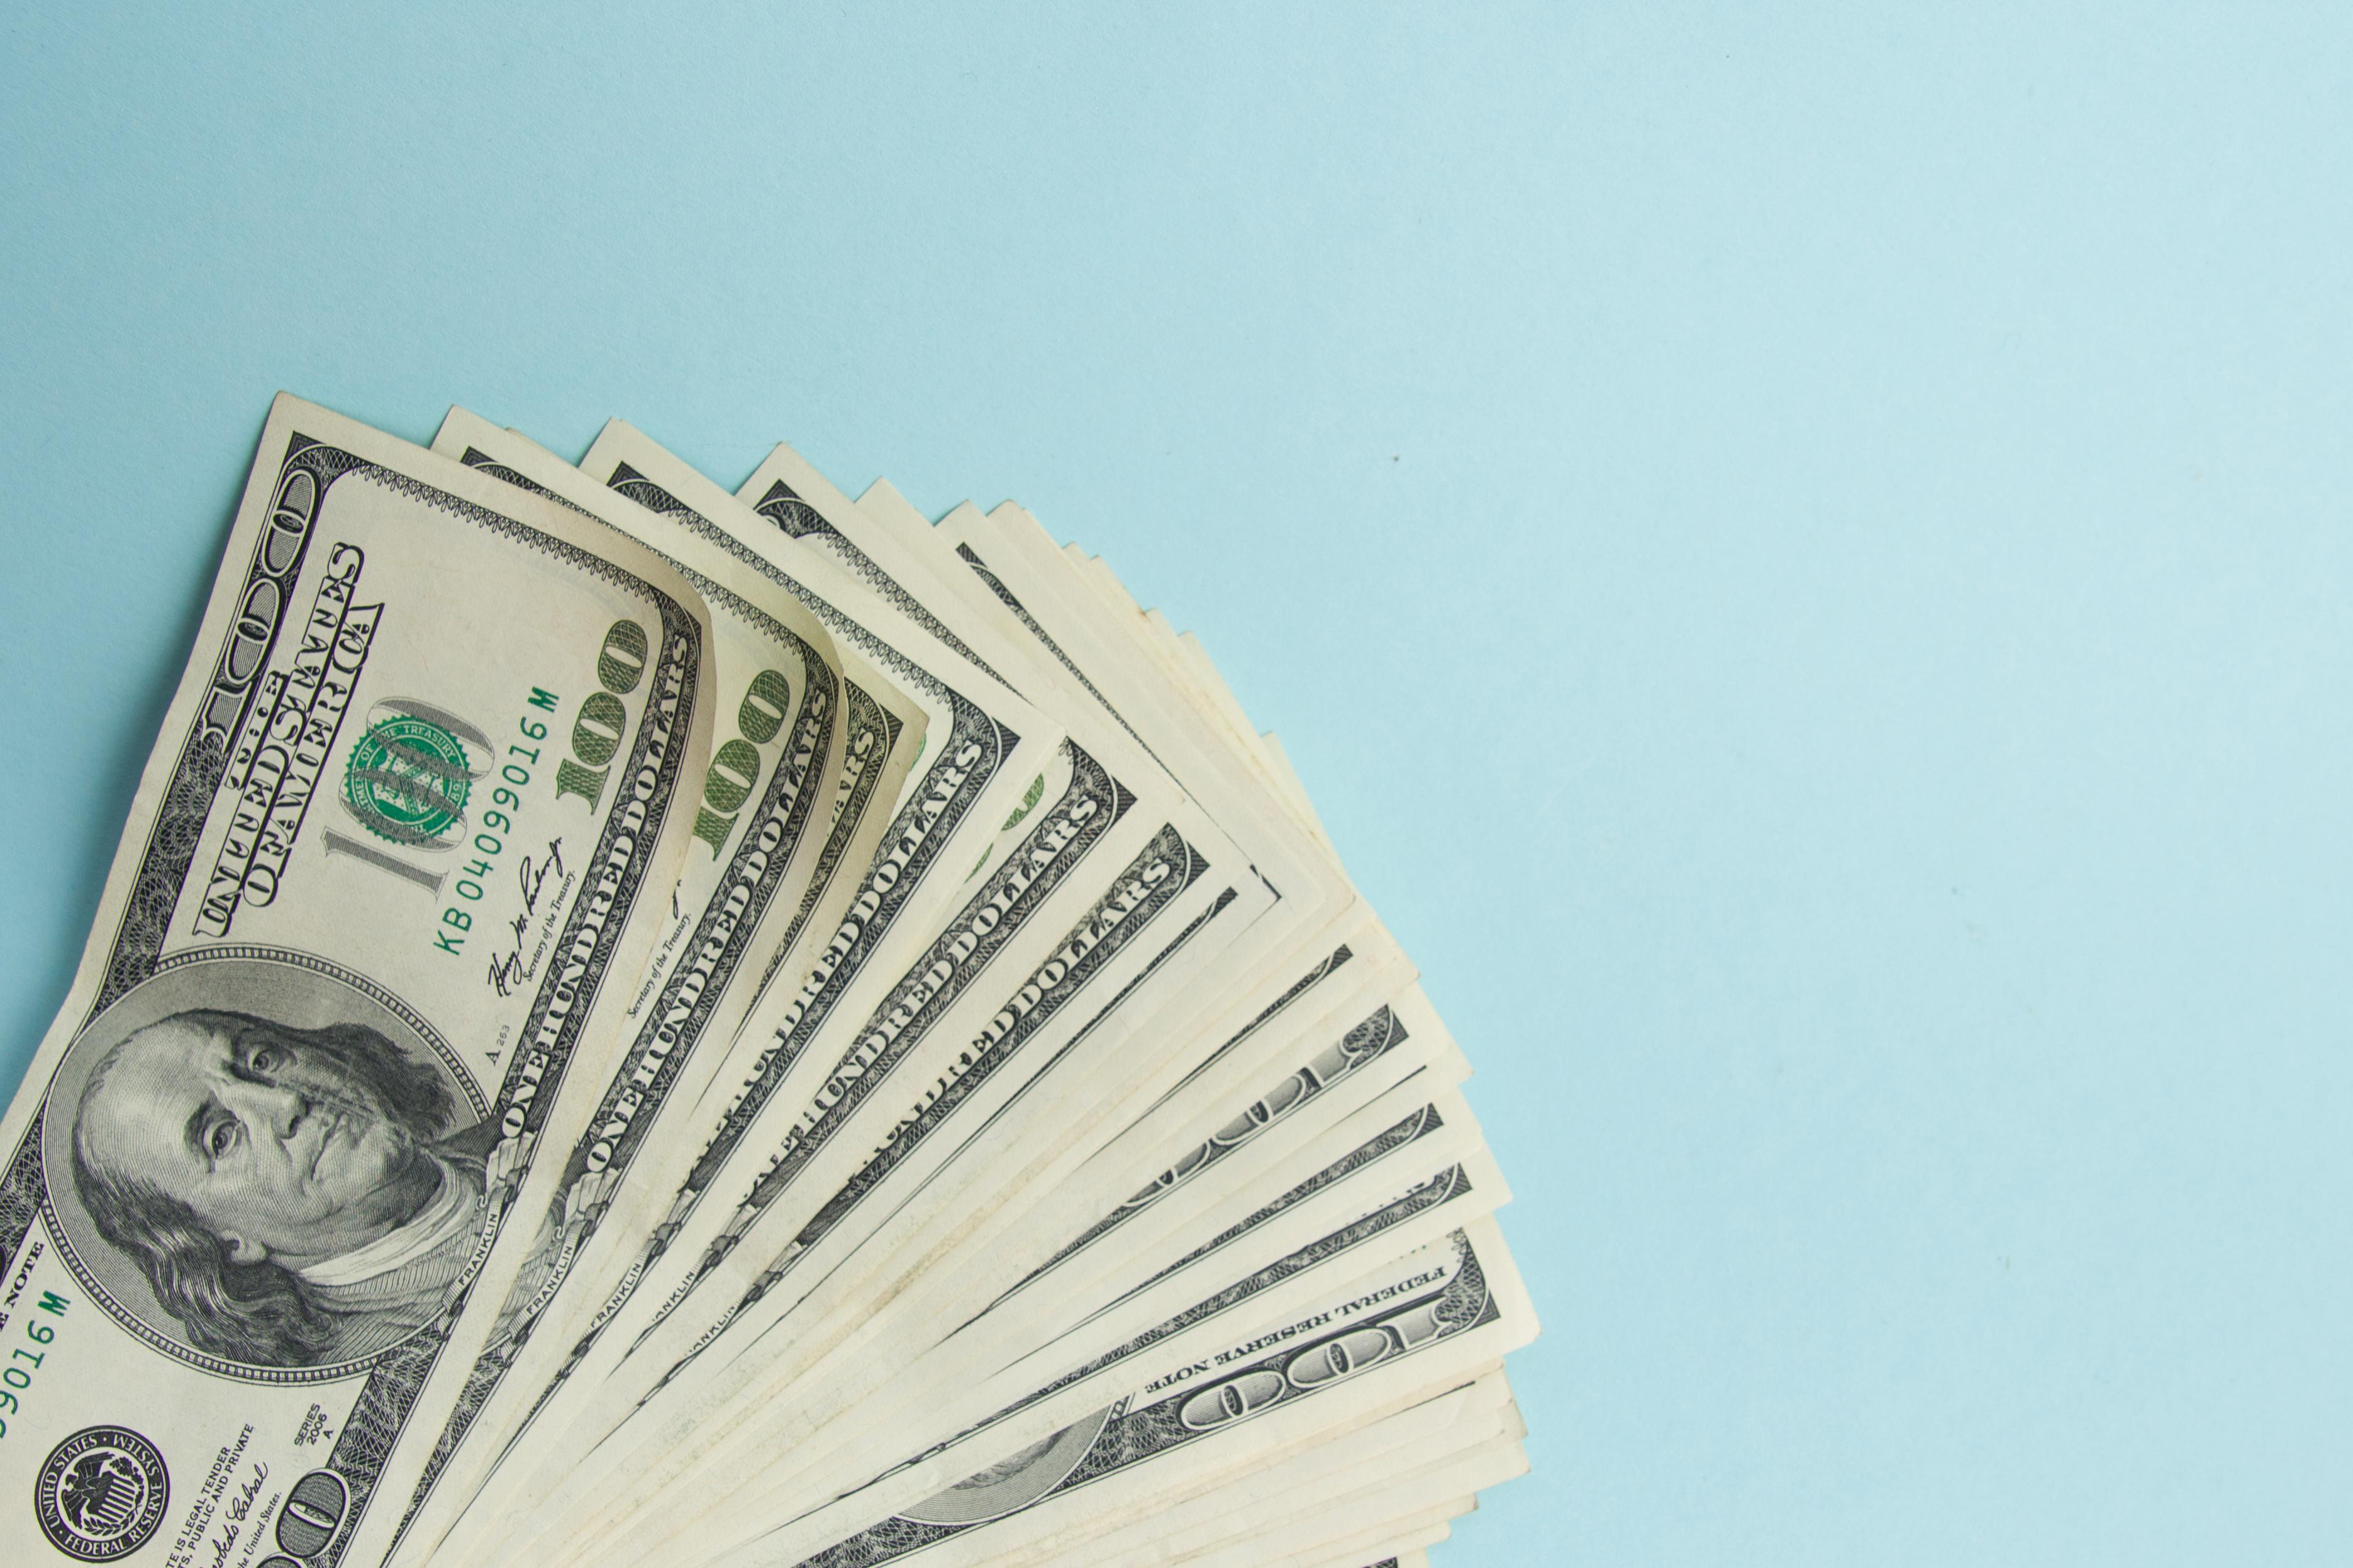 5 Tips for Making More Money